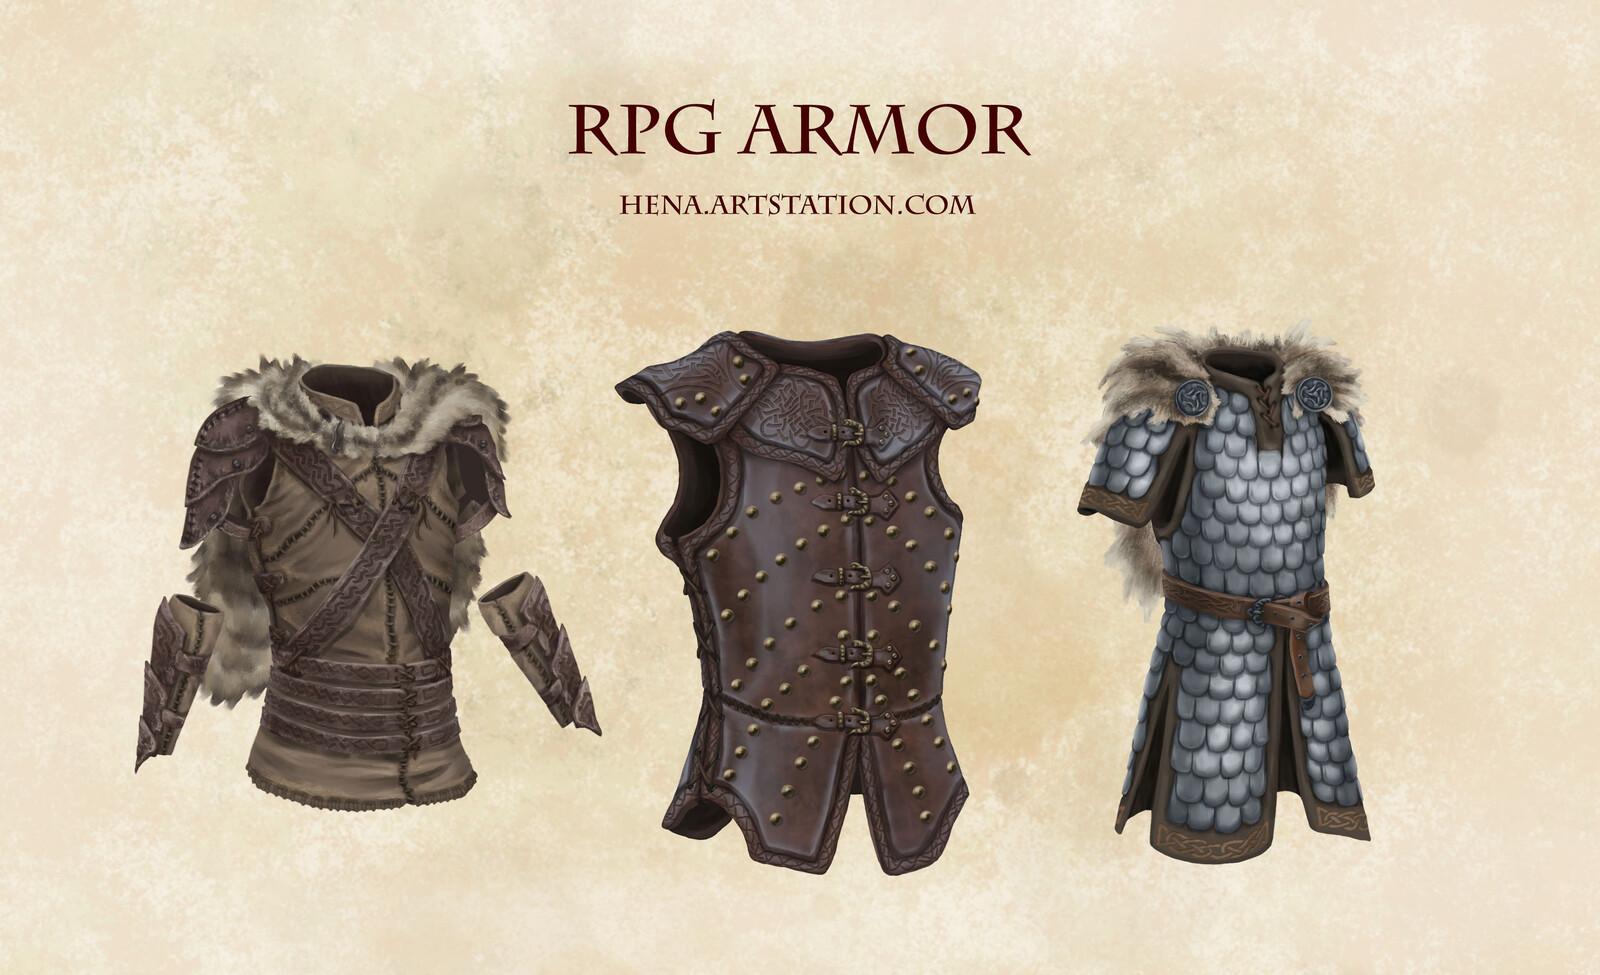 DSA: RPG Armor (Thorwal)